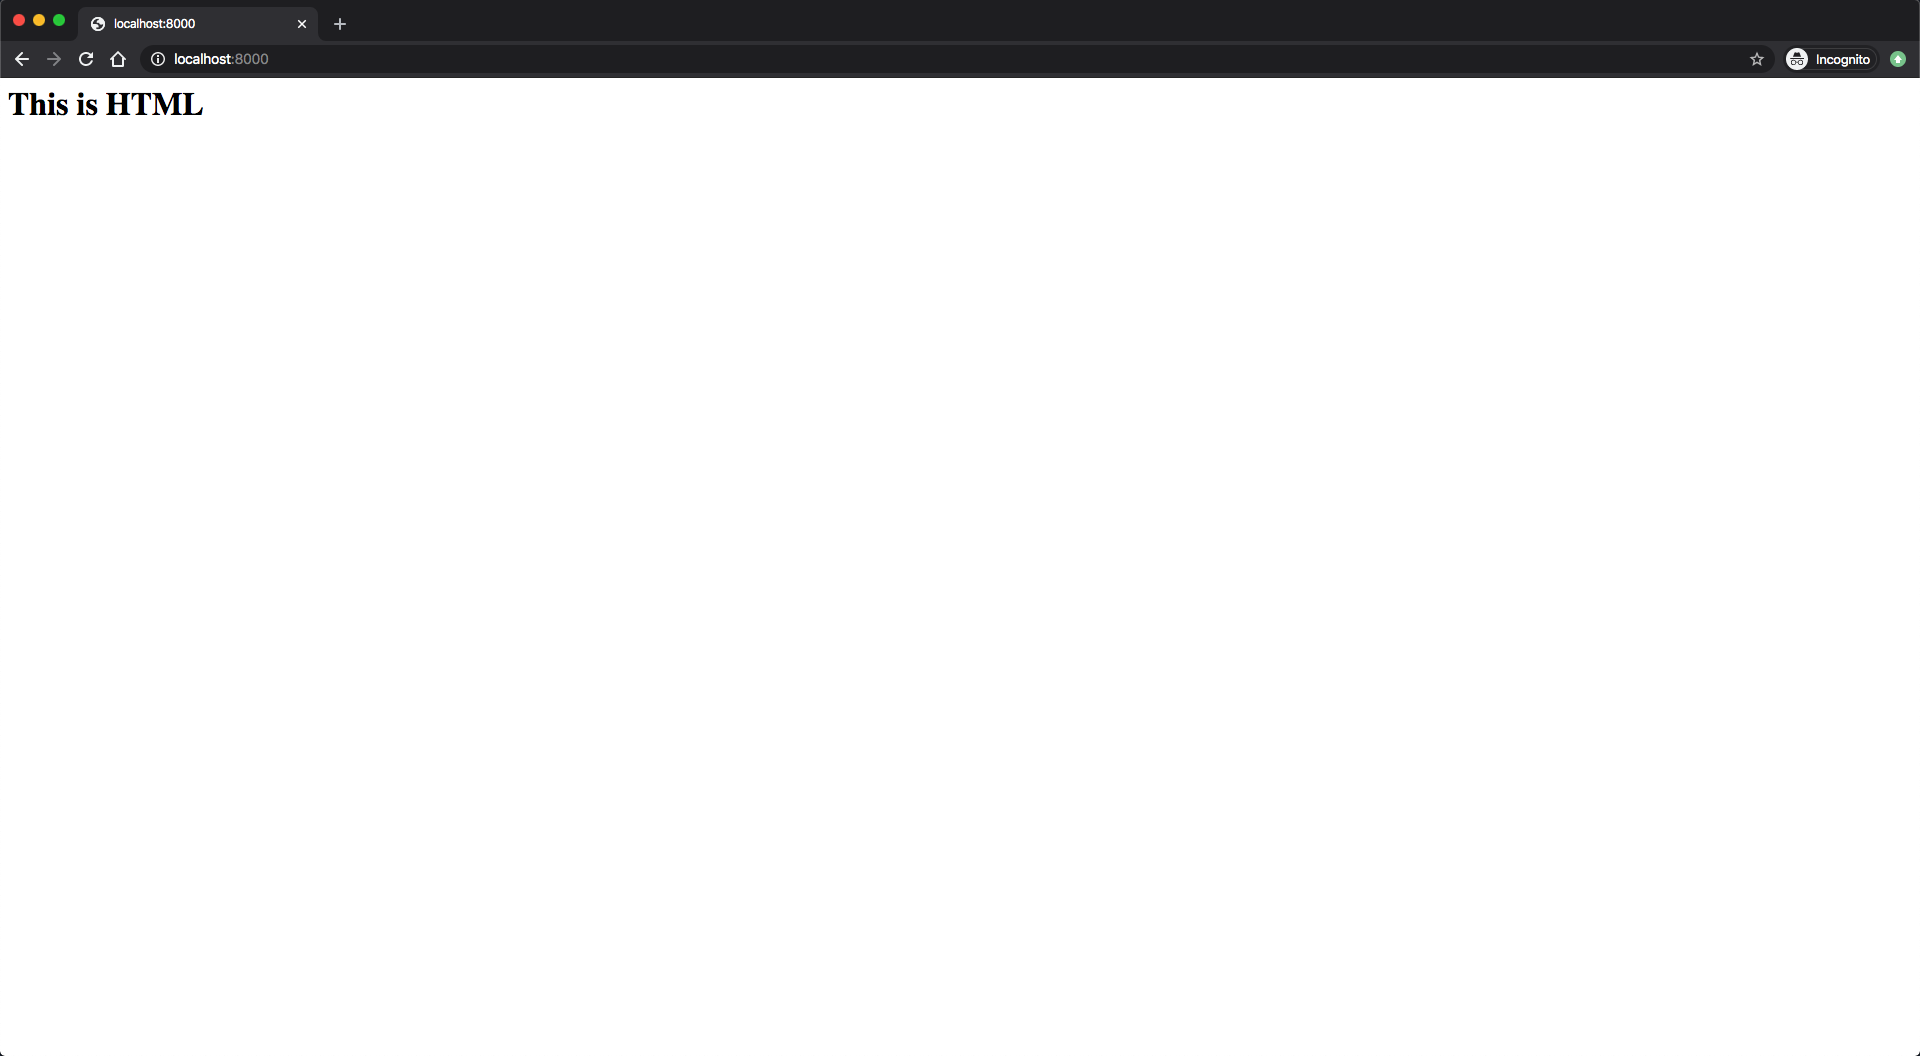 Image of HTML response returned from Node.js server